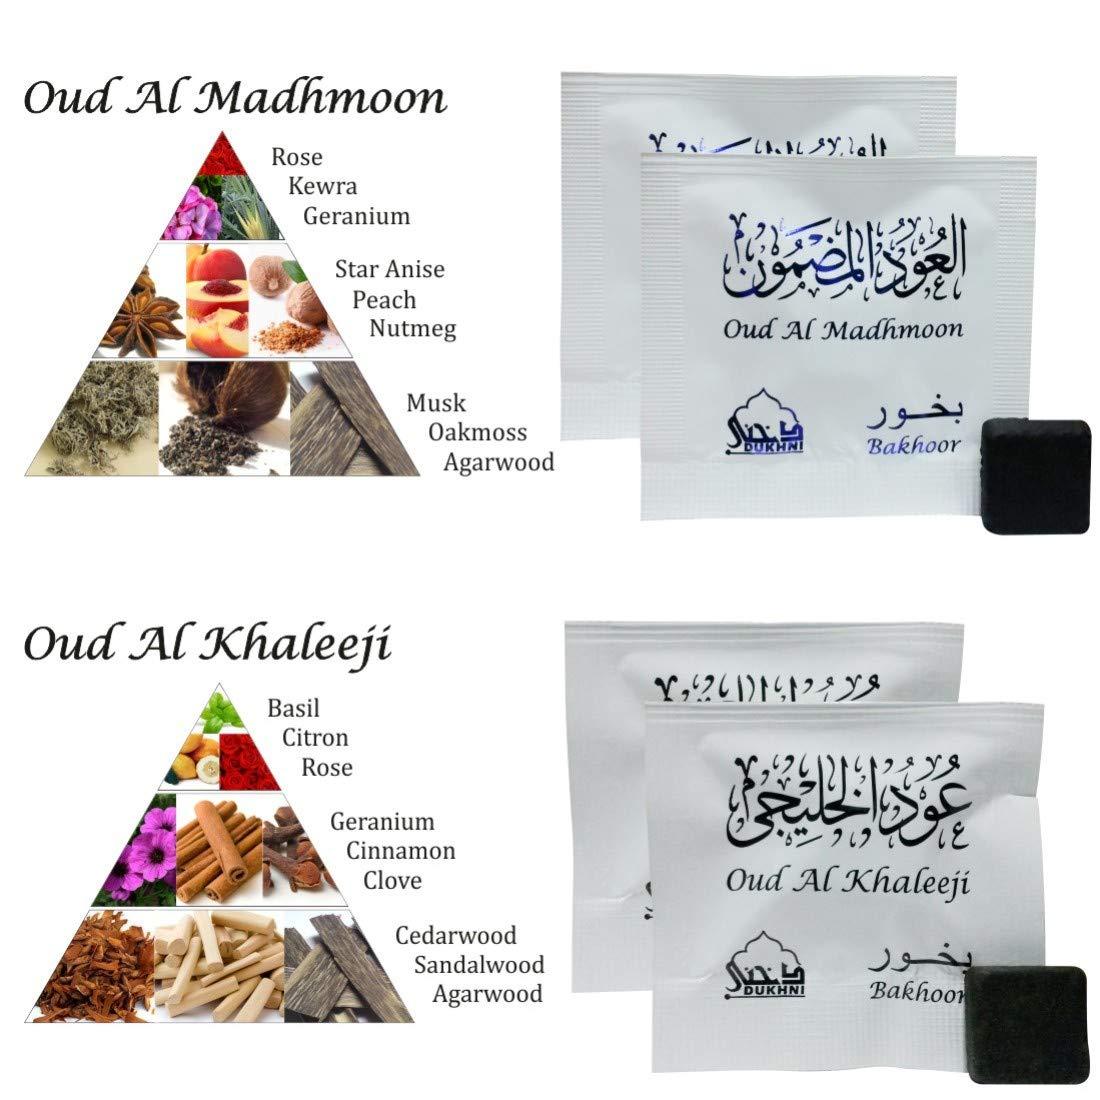 Dukhni Oud Bakhoor Incense Variety Box & Rainbow Bakhoor Burner - Gift Set & Starter Kit by Dukhni (Image #8)